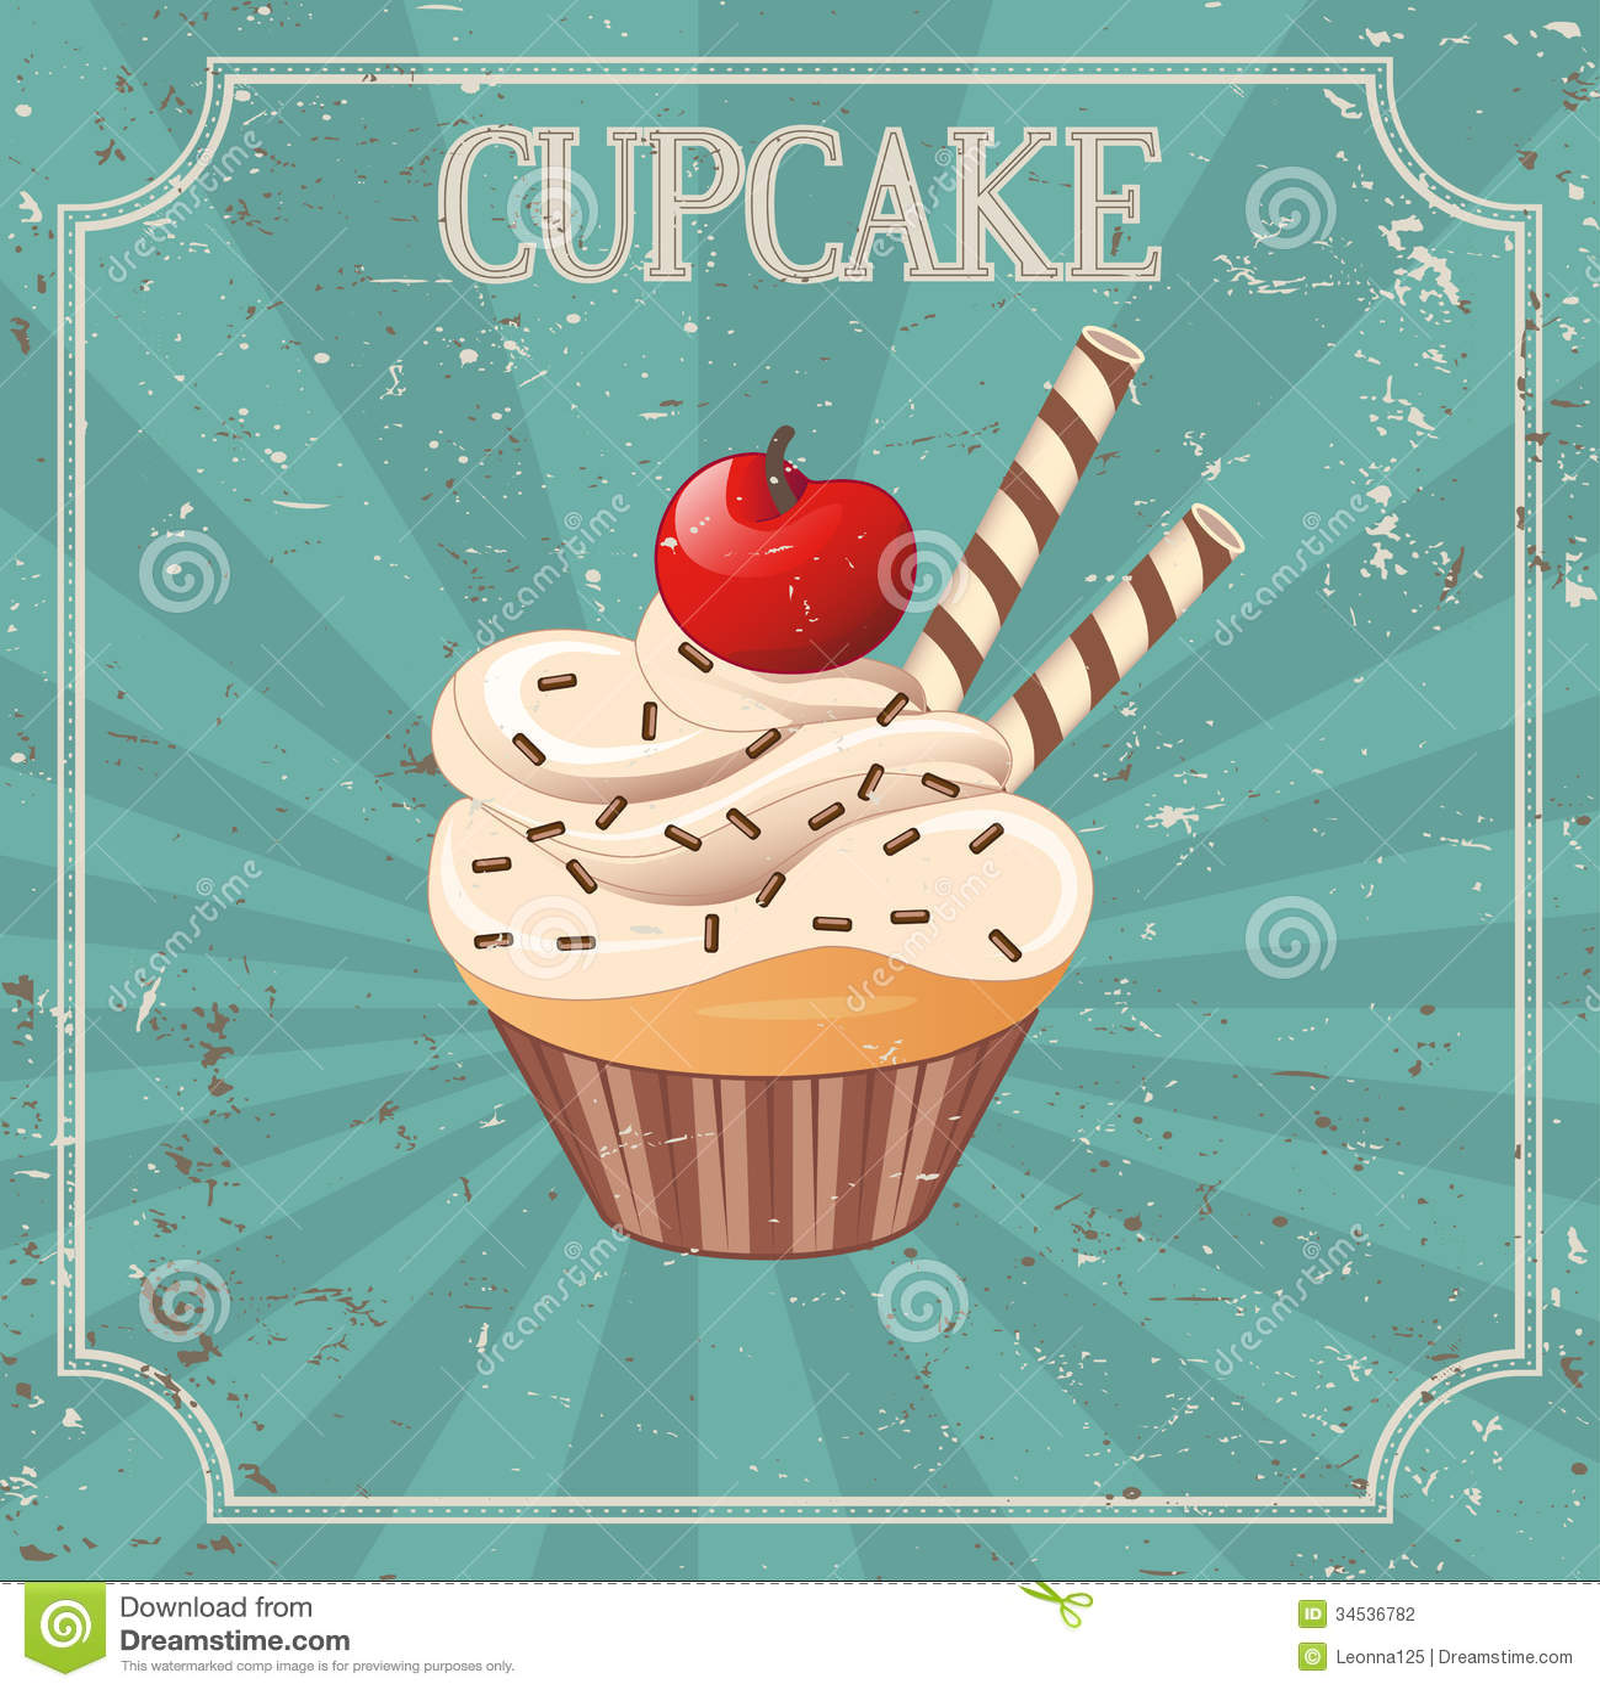 Illustration On Vintage Photography Cupcakes Background Stock Cupcake Image